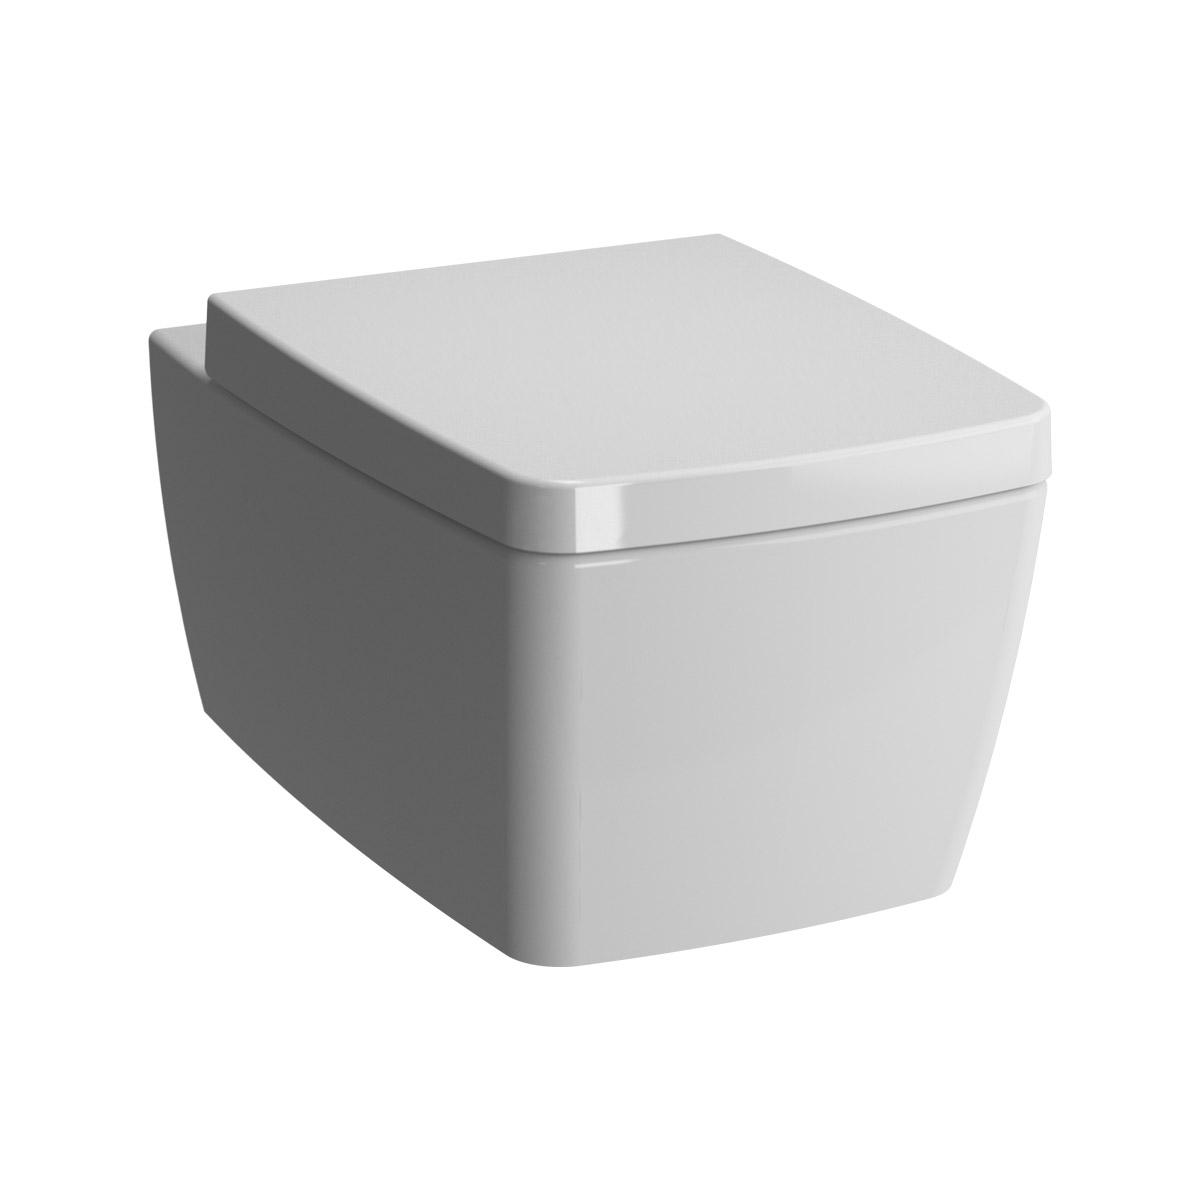 Metropole Wand-WC mit Bidetfunktion